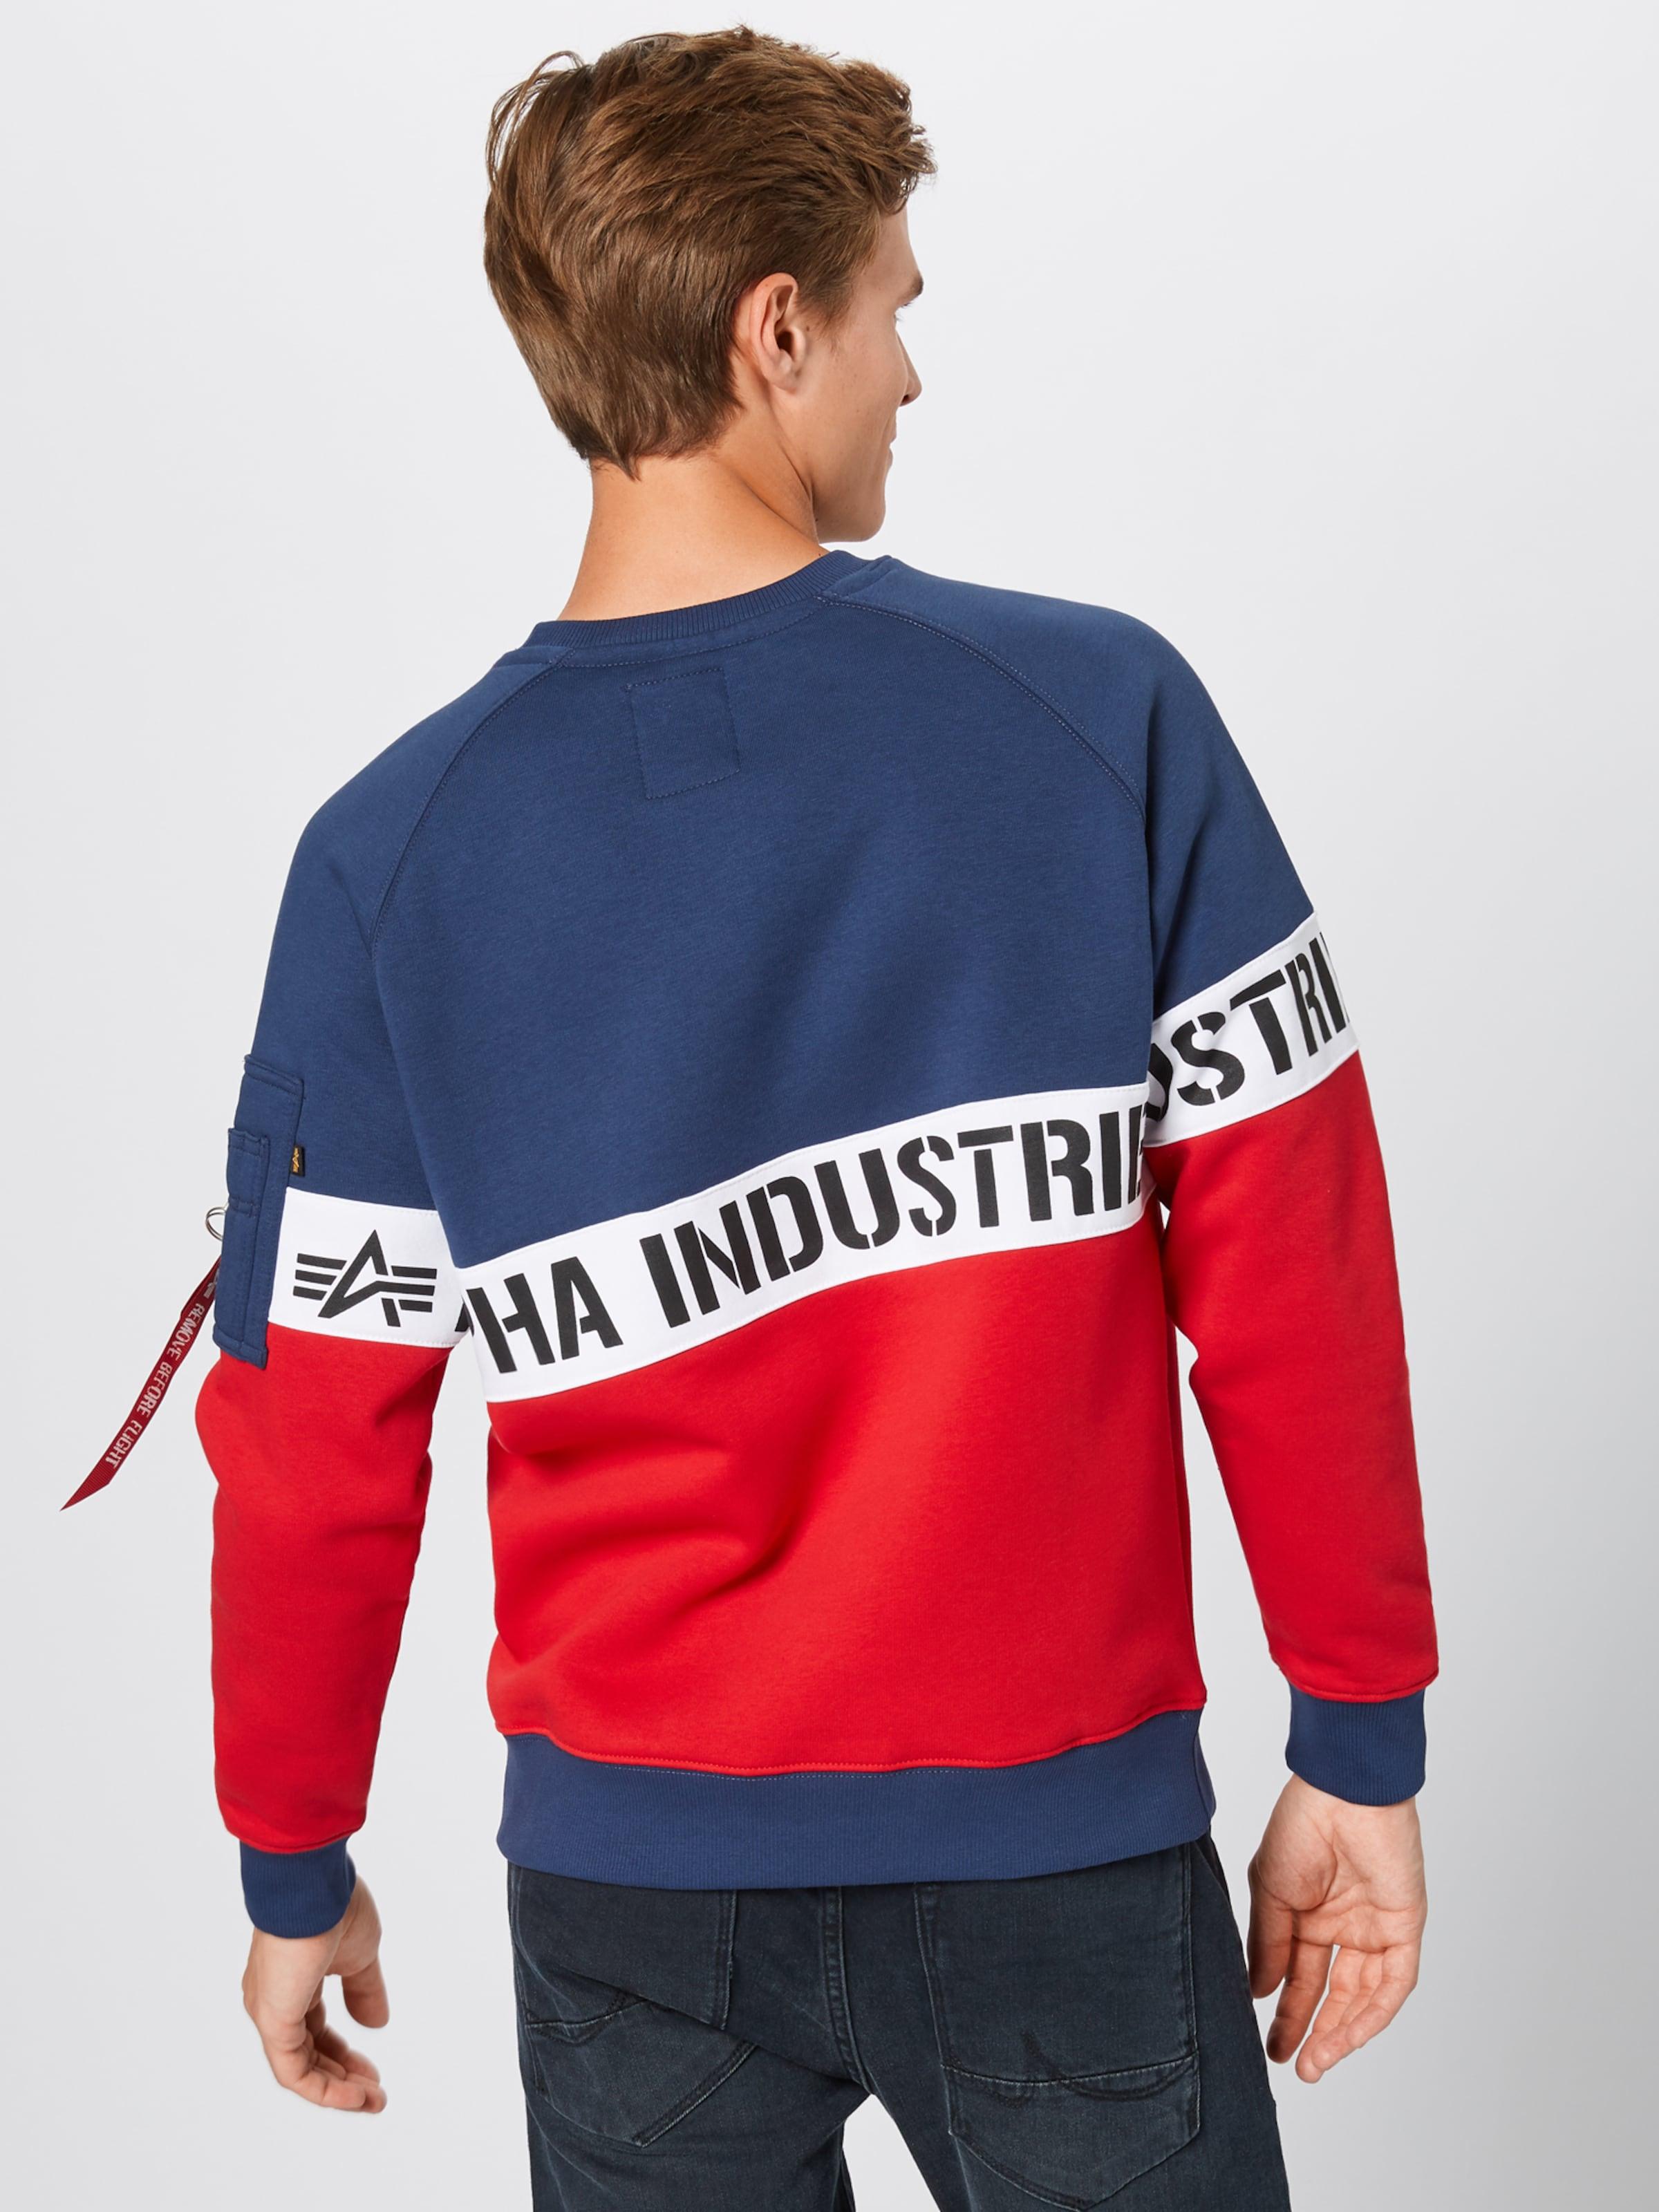 Sweatshirts In Industries Alpha Alpha NavyRot Yfg6vb7y